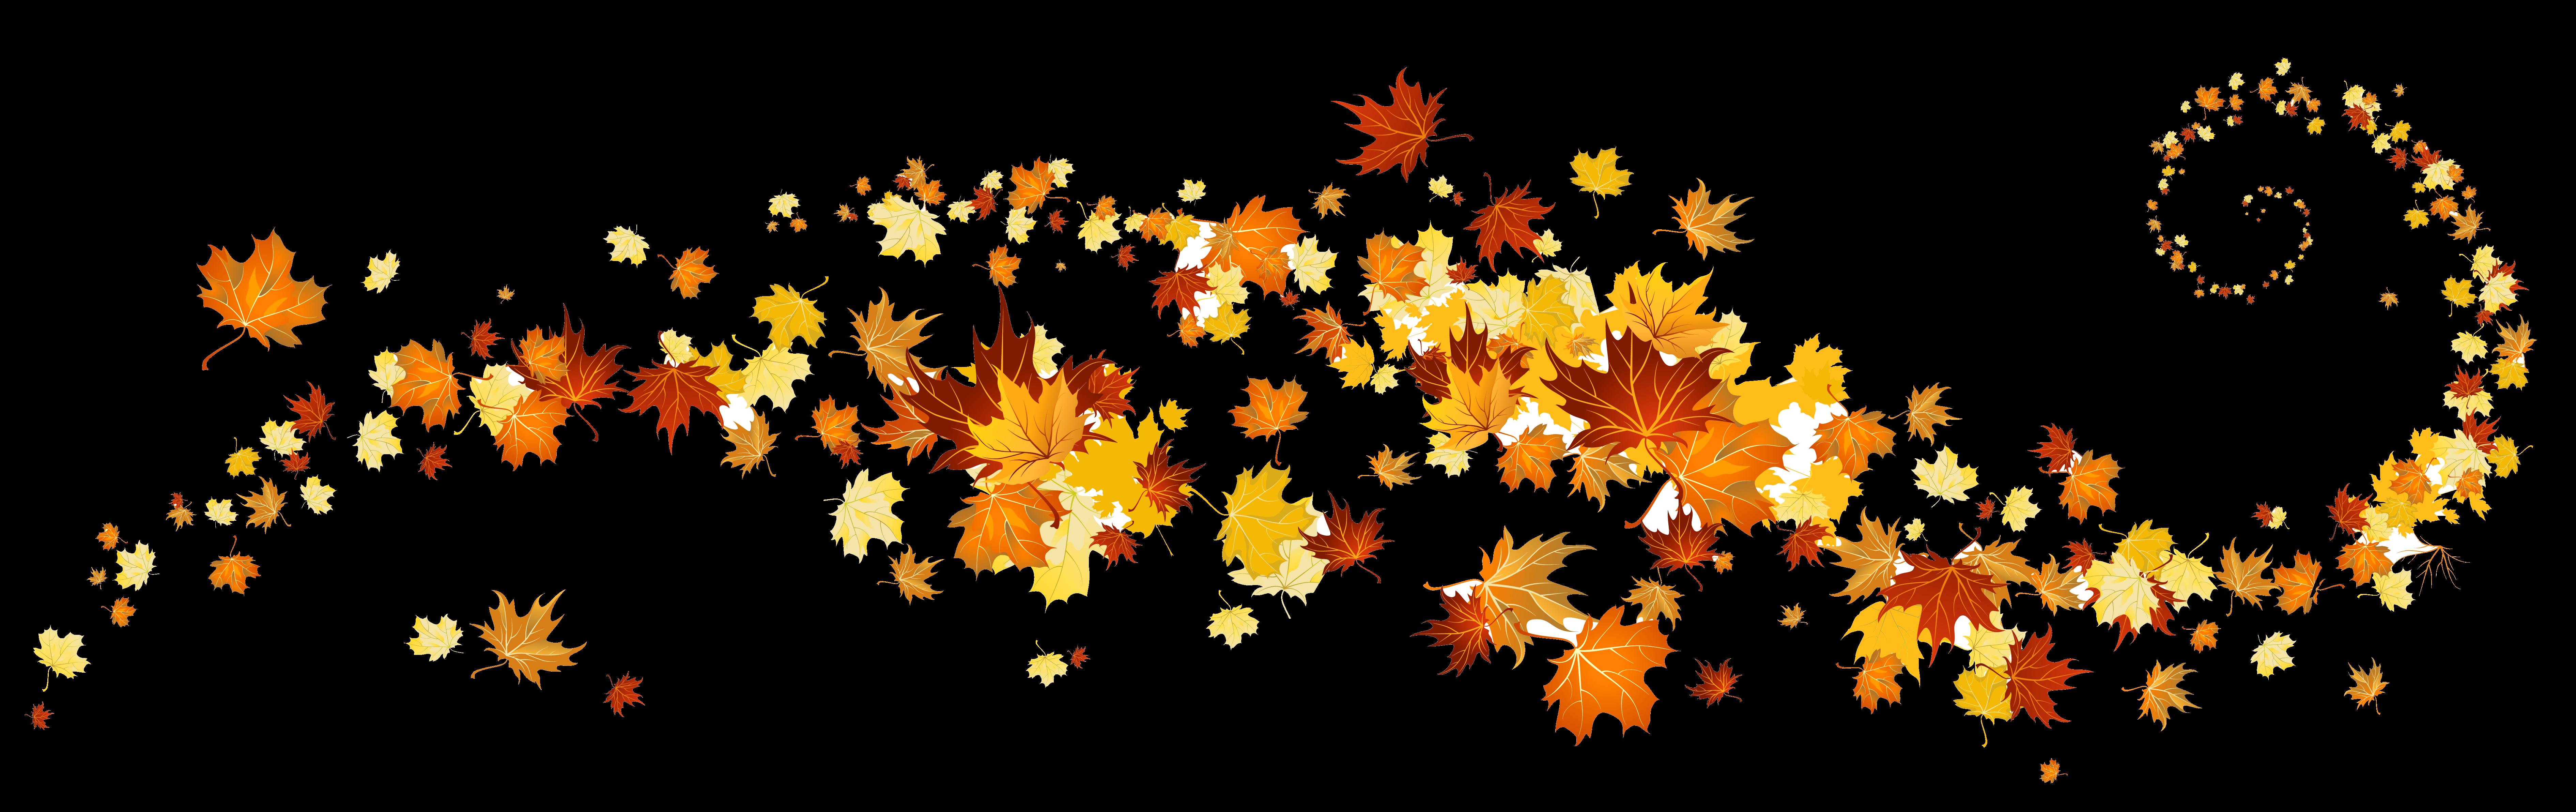 Fall Decorations Clipart Transparent Png.